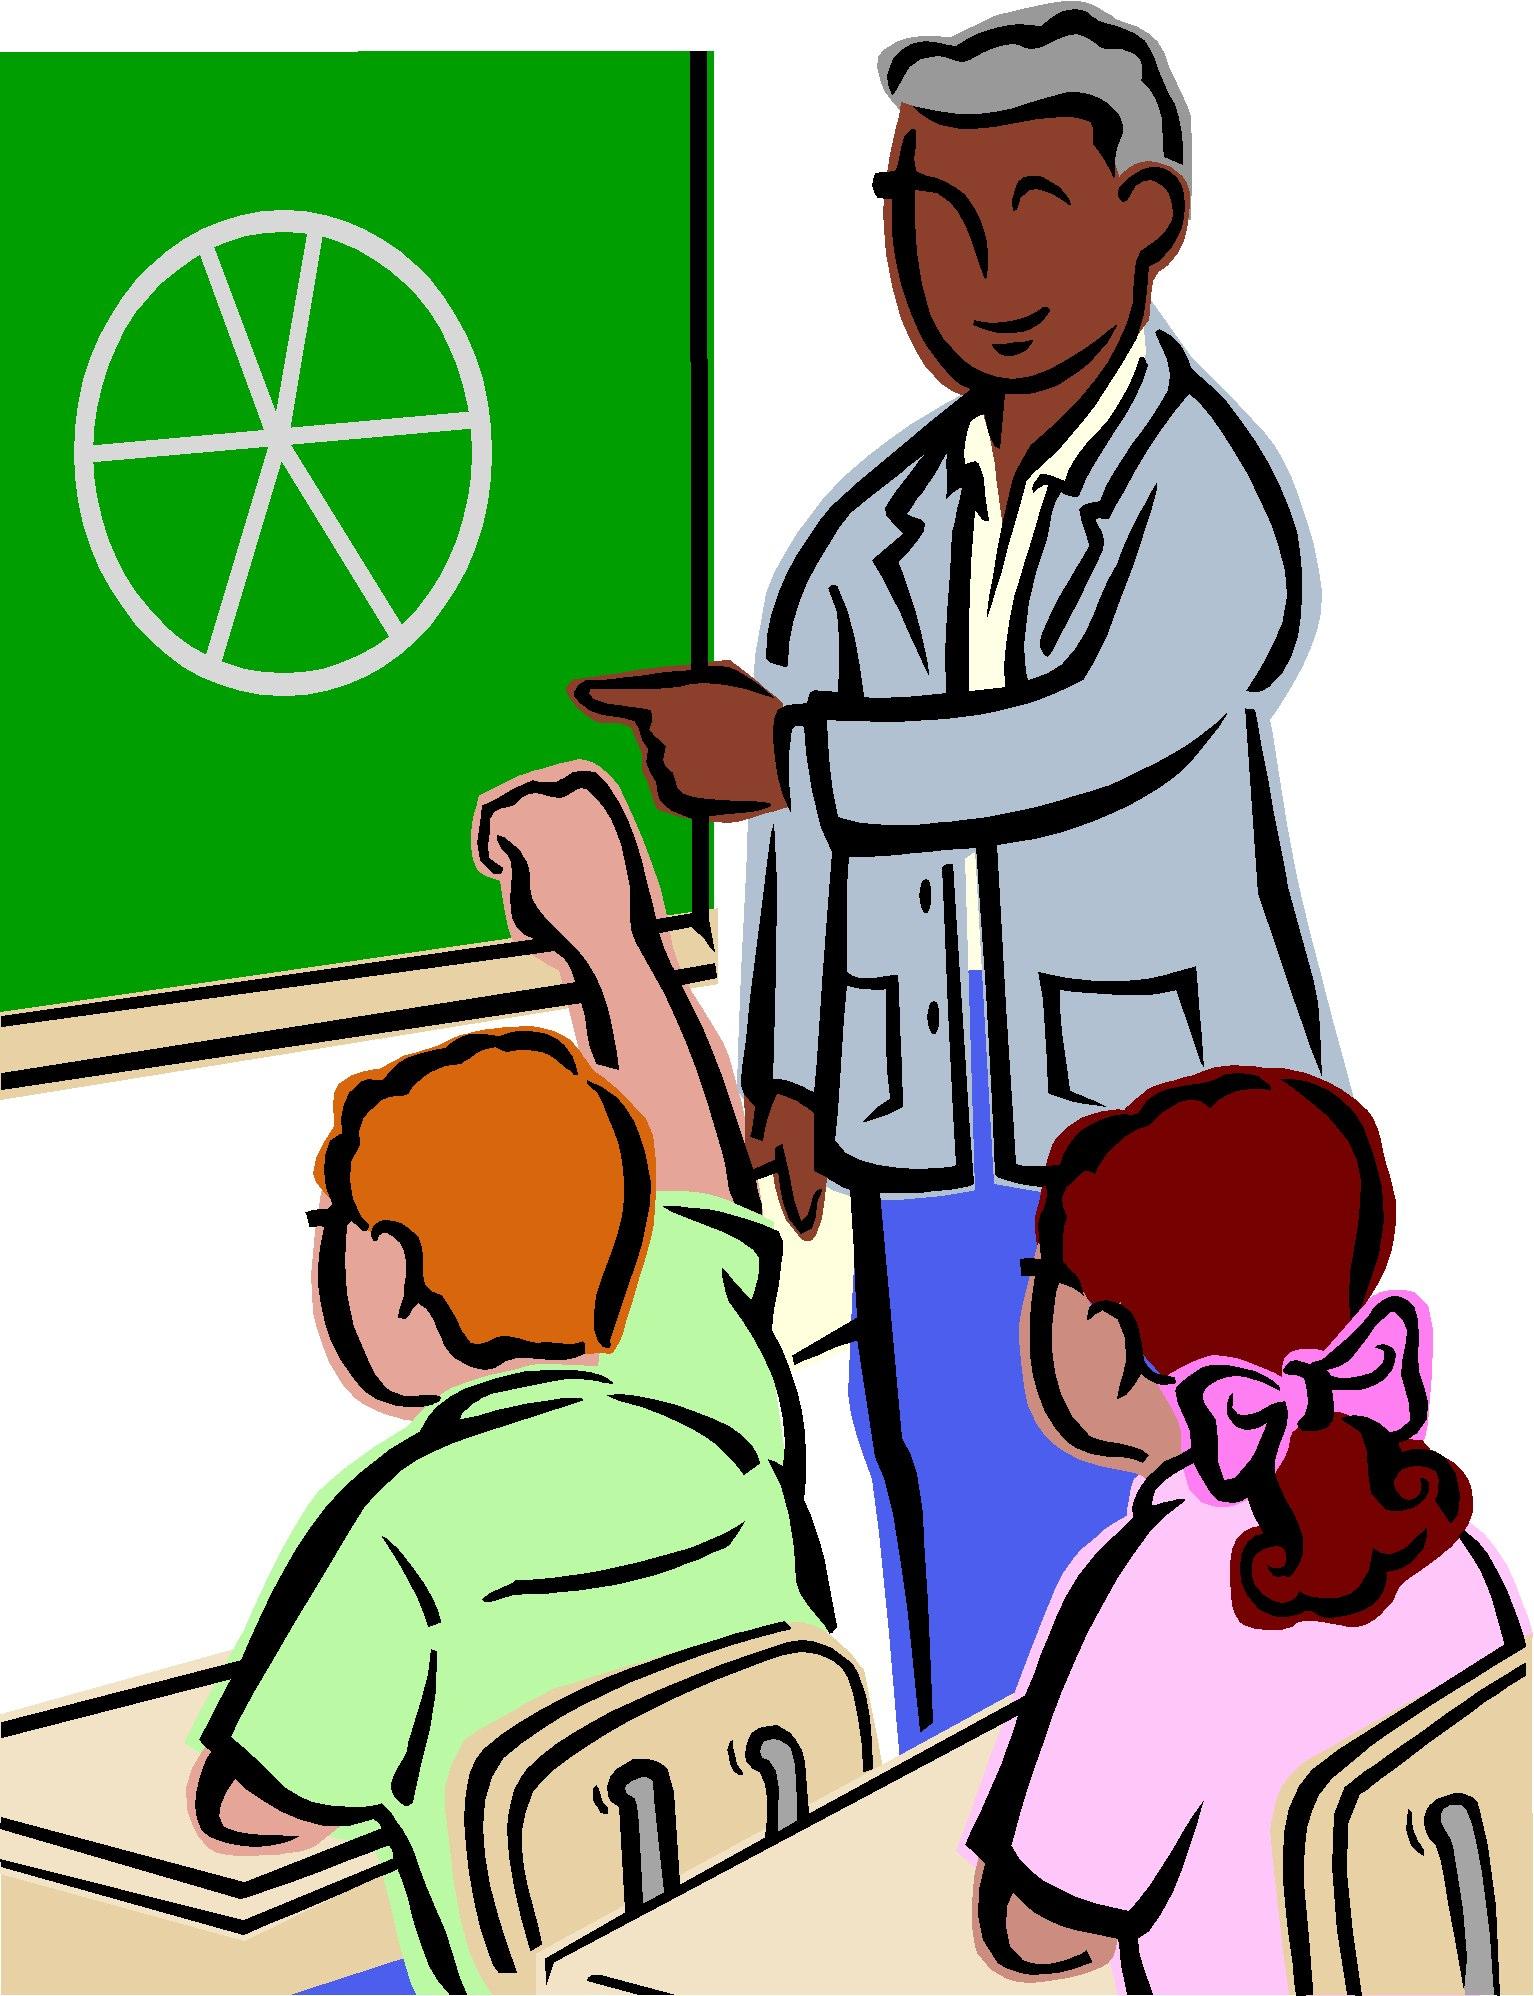 Clip art of teachers. Free teacher clipart images